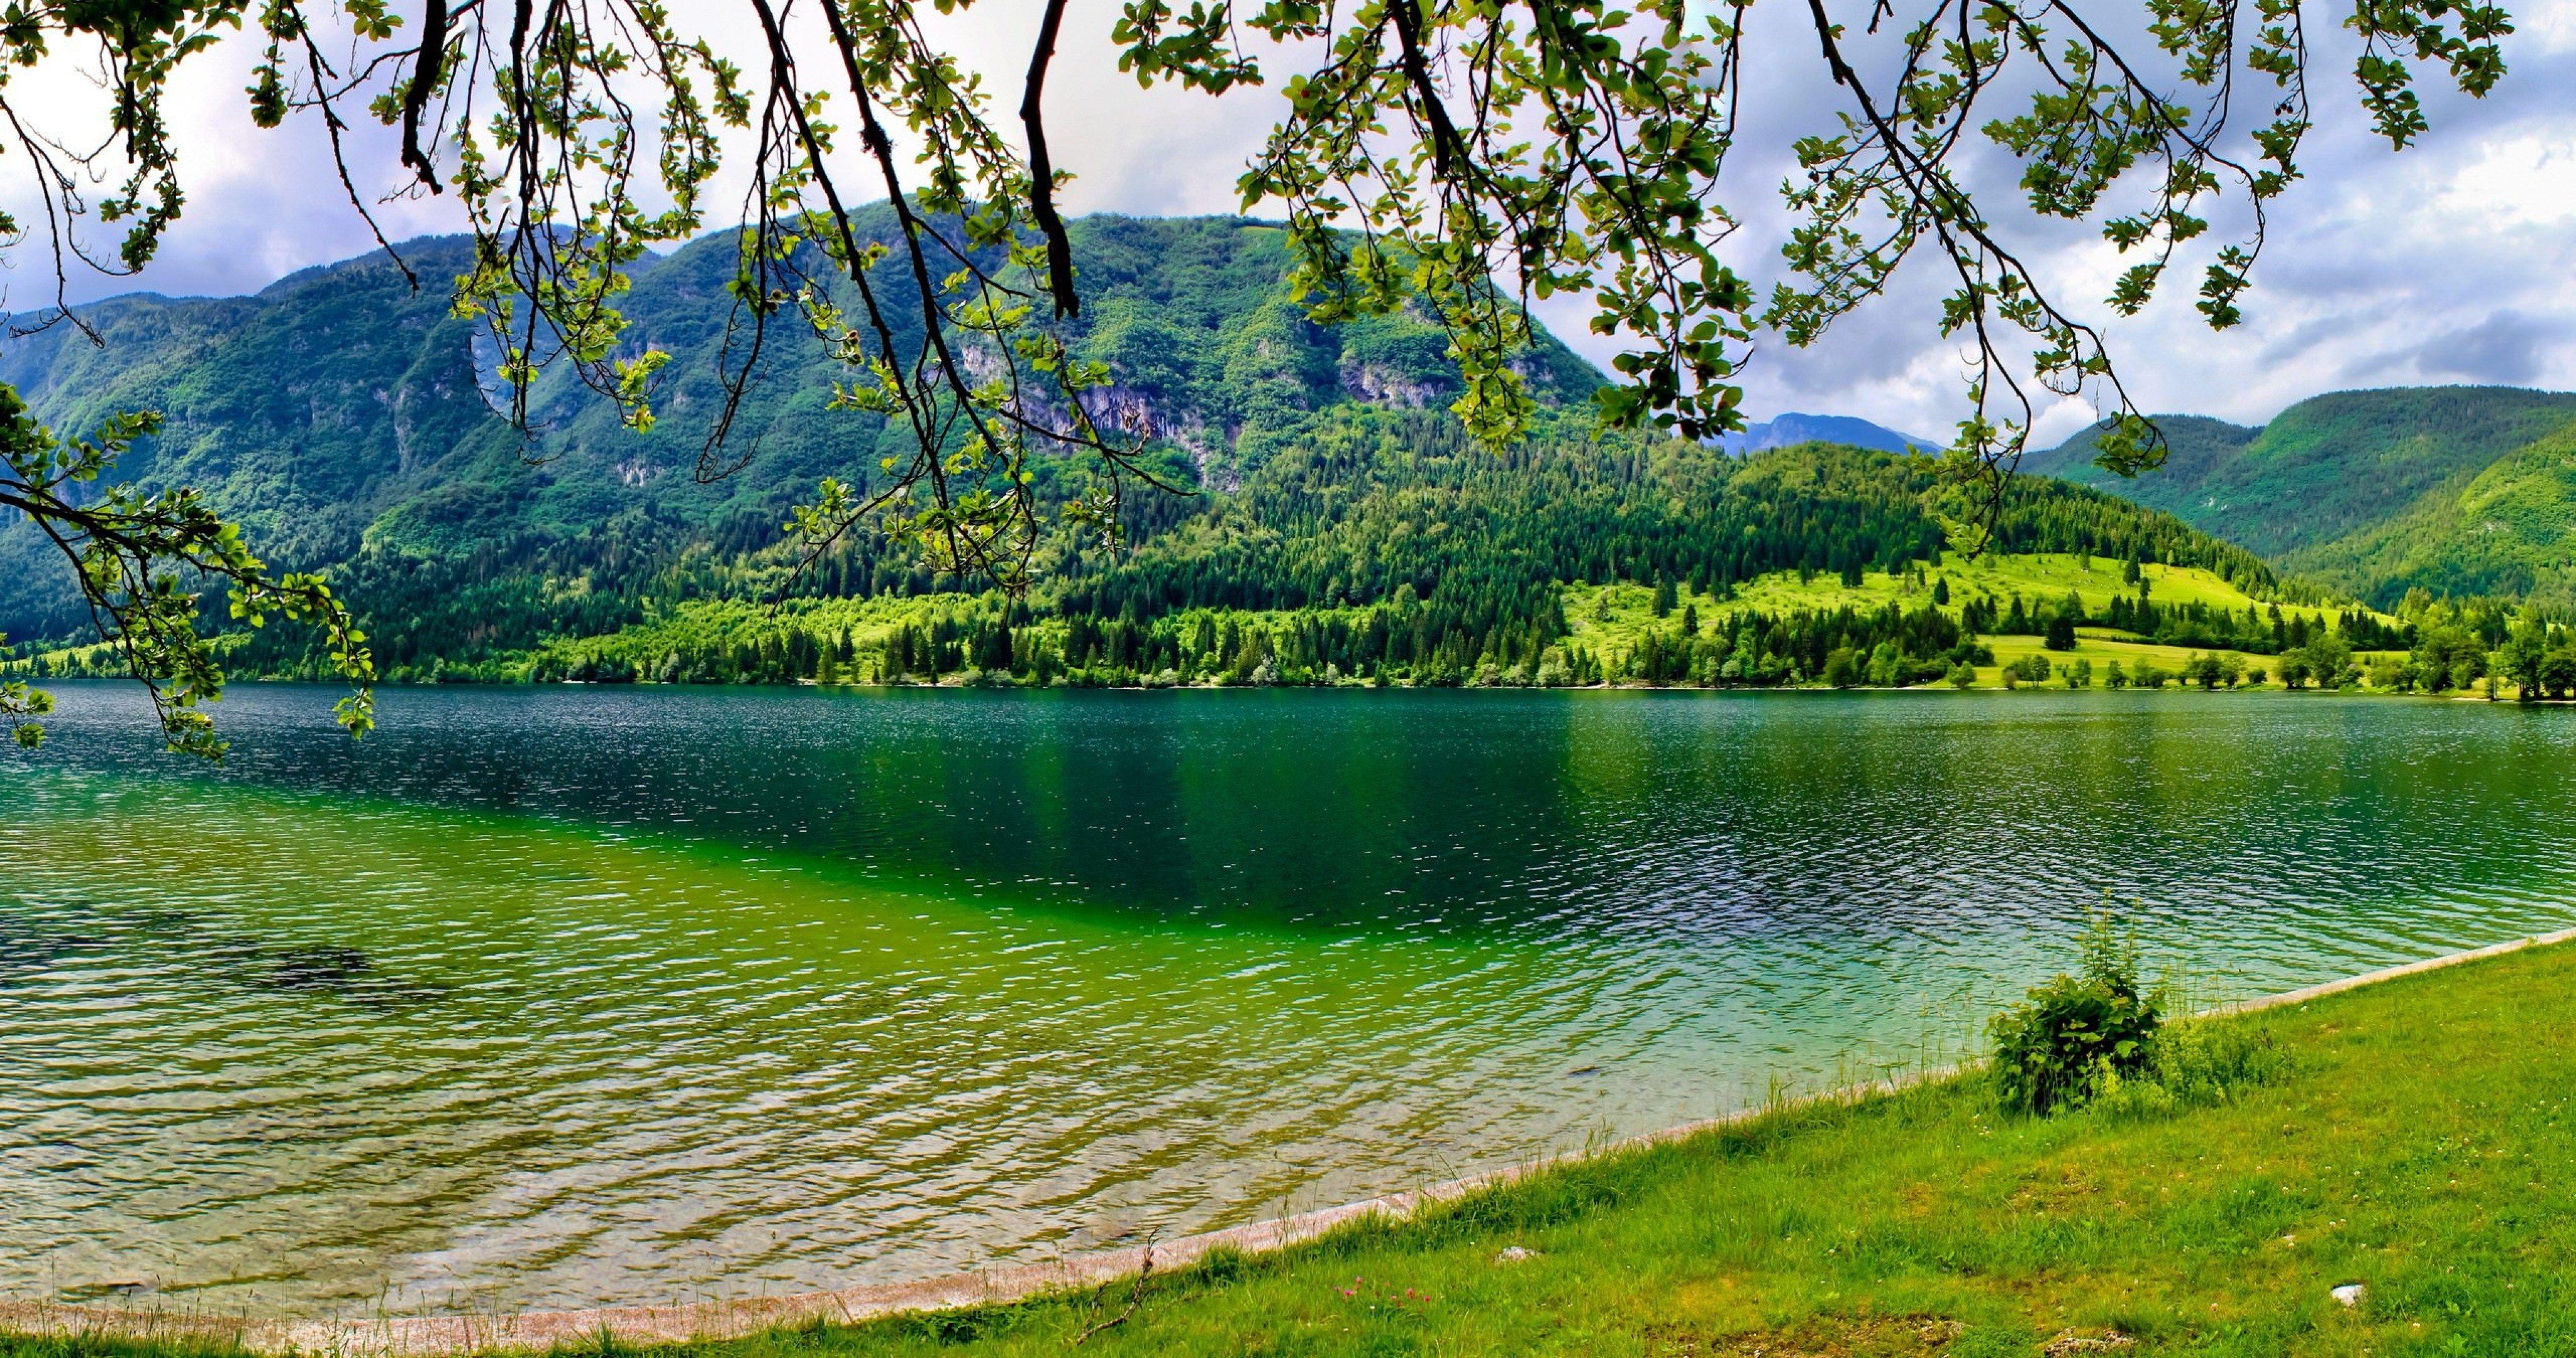 Ultra Hd Wallpaper 4k Green Mountains Natural Trees: Slovenia Bohinj 4k Ultra Hd Wallpaper